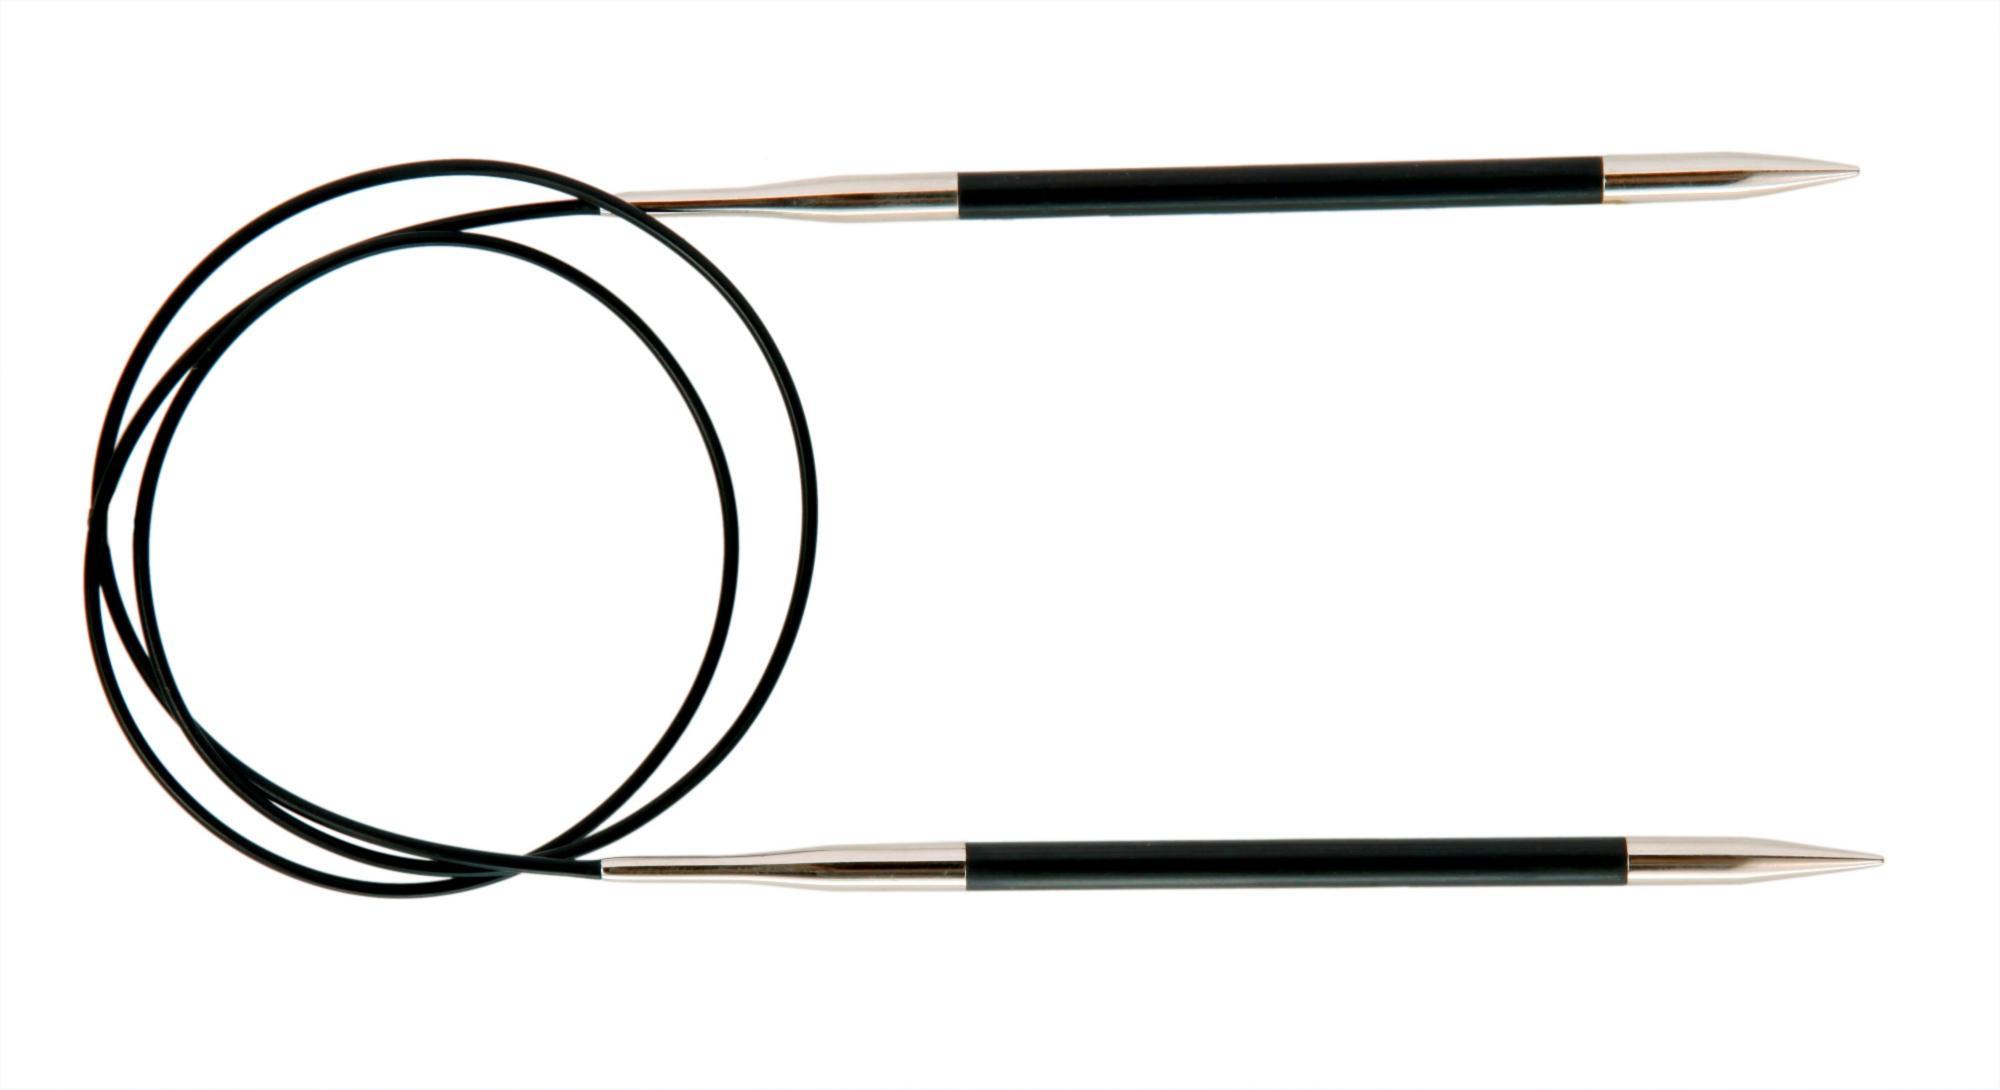 Спицы круговые 100 см Karbonz KnitPro, 41216, 8.00 мм